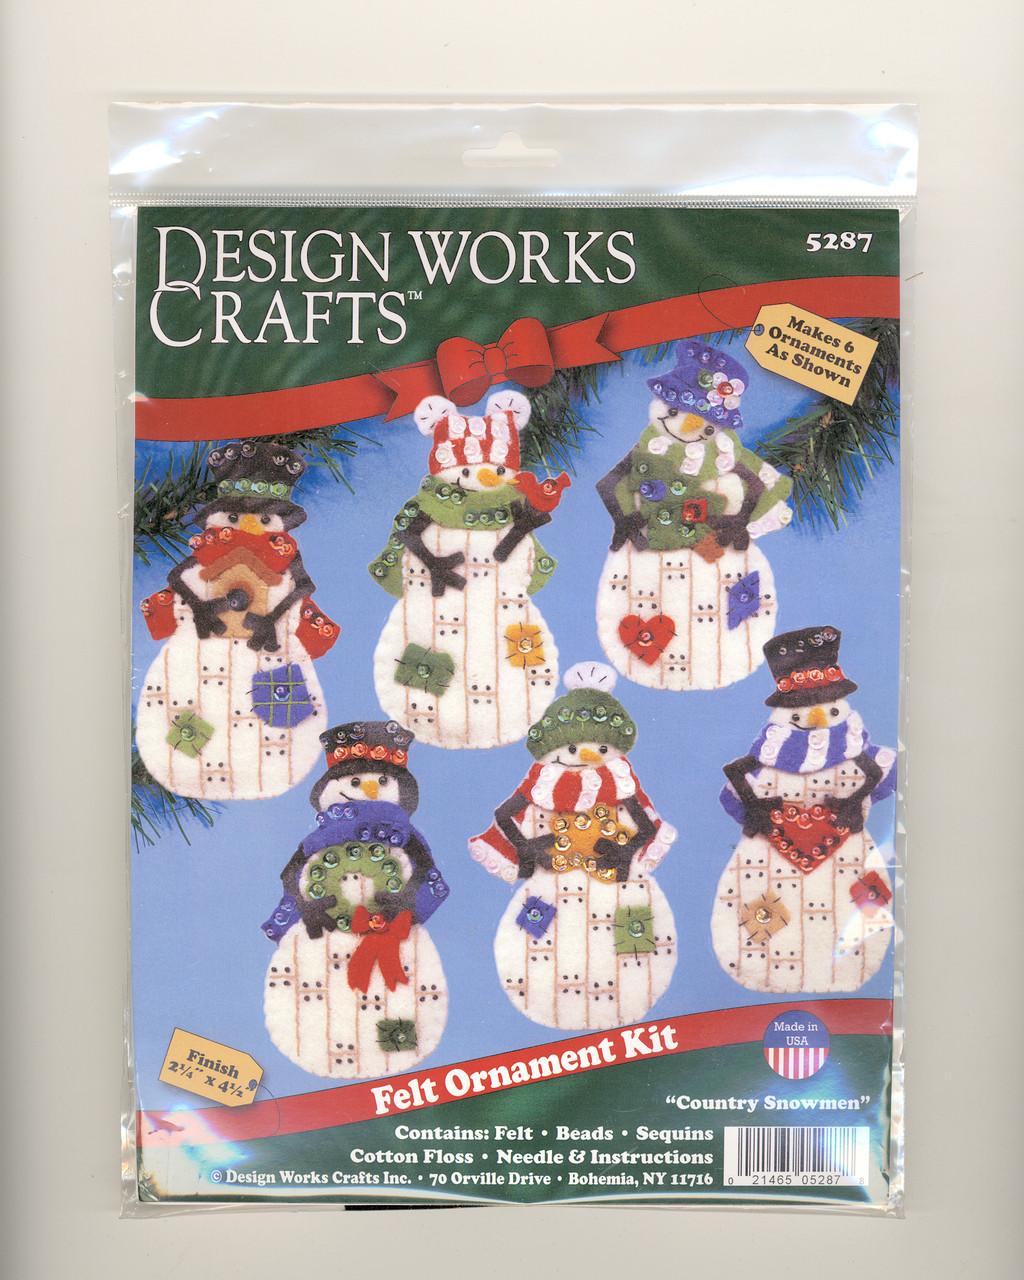 Design Works - Country Snowman Felt Ornaments (6)